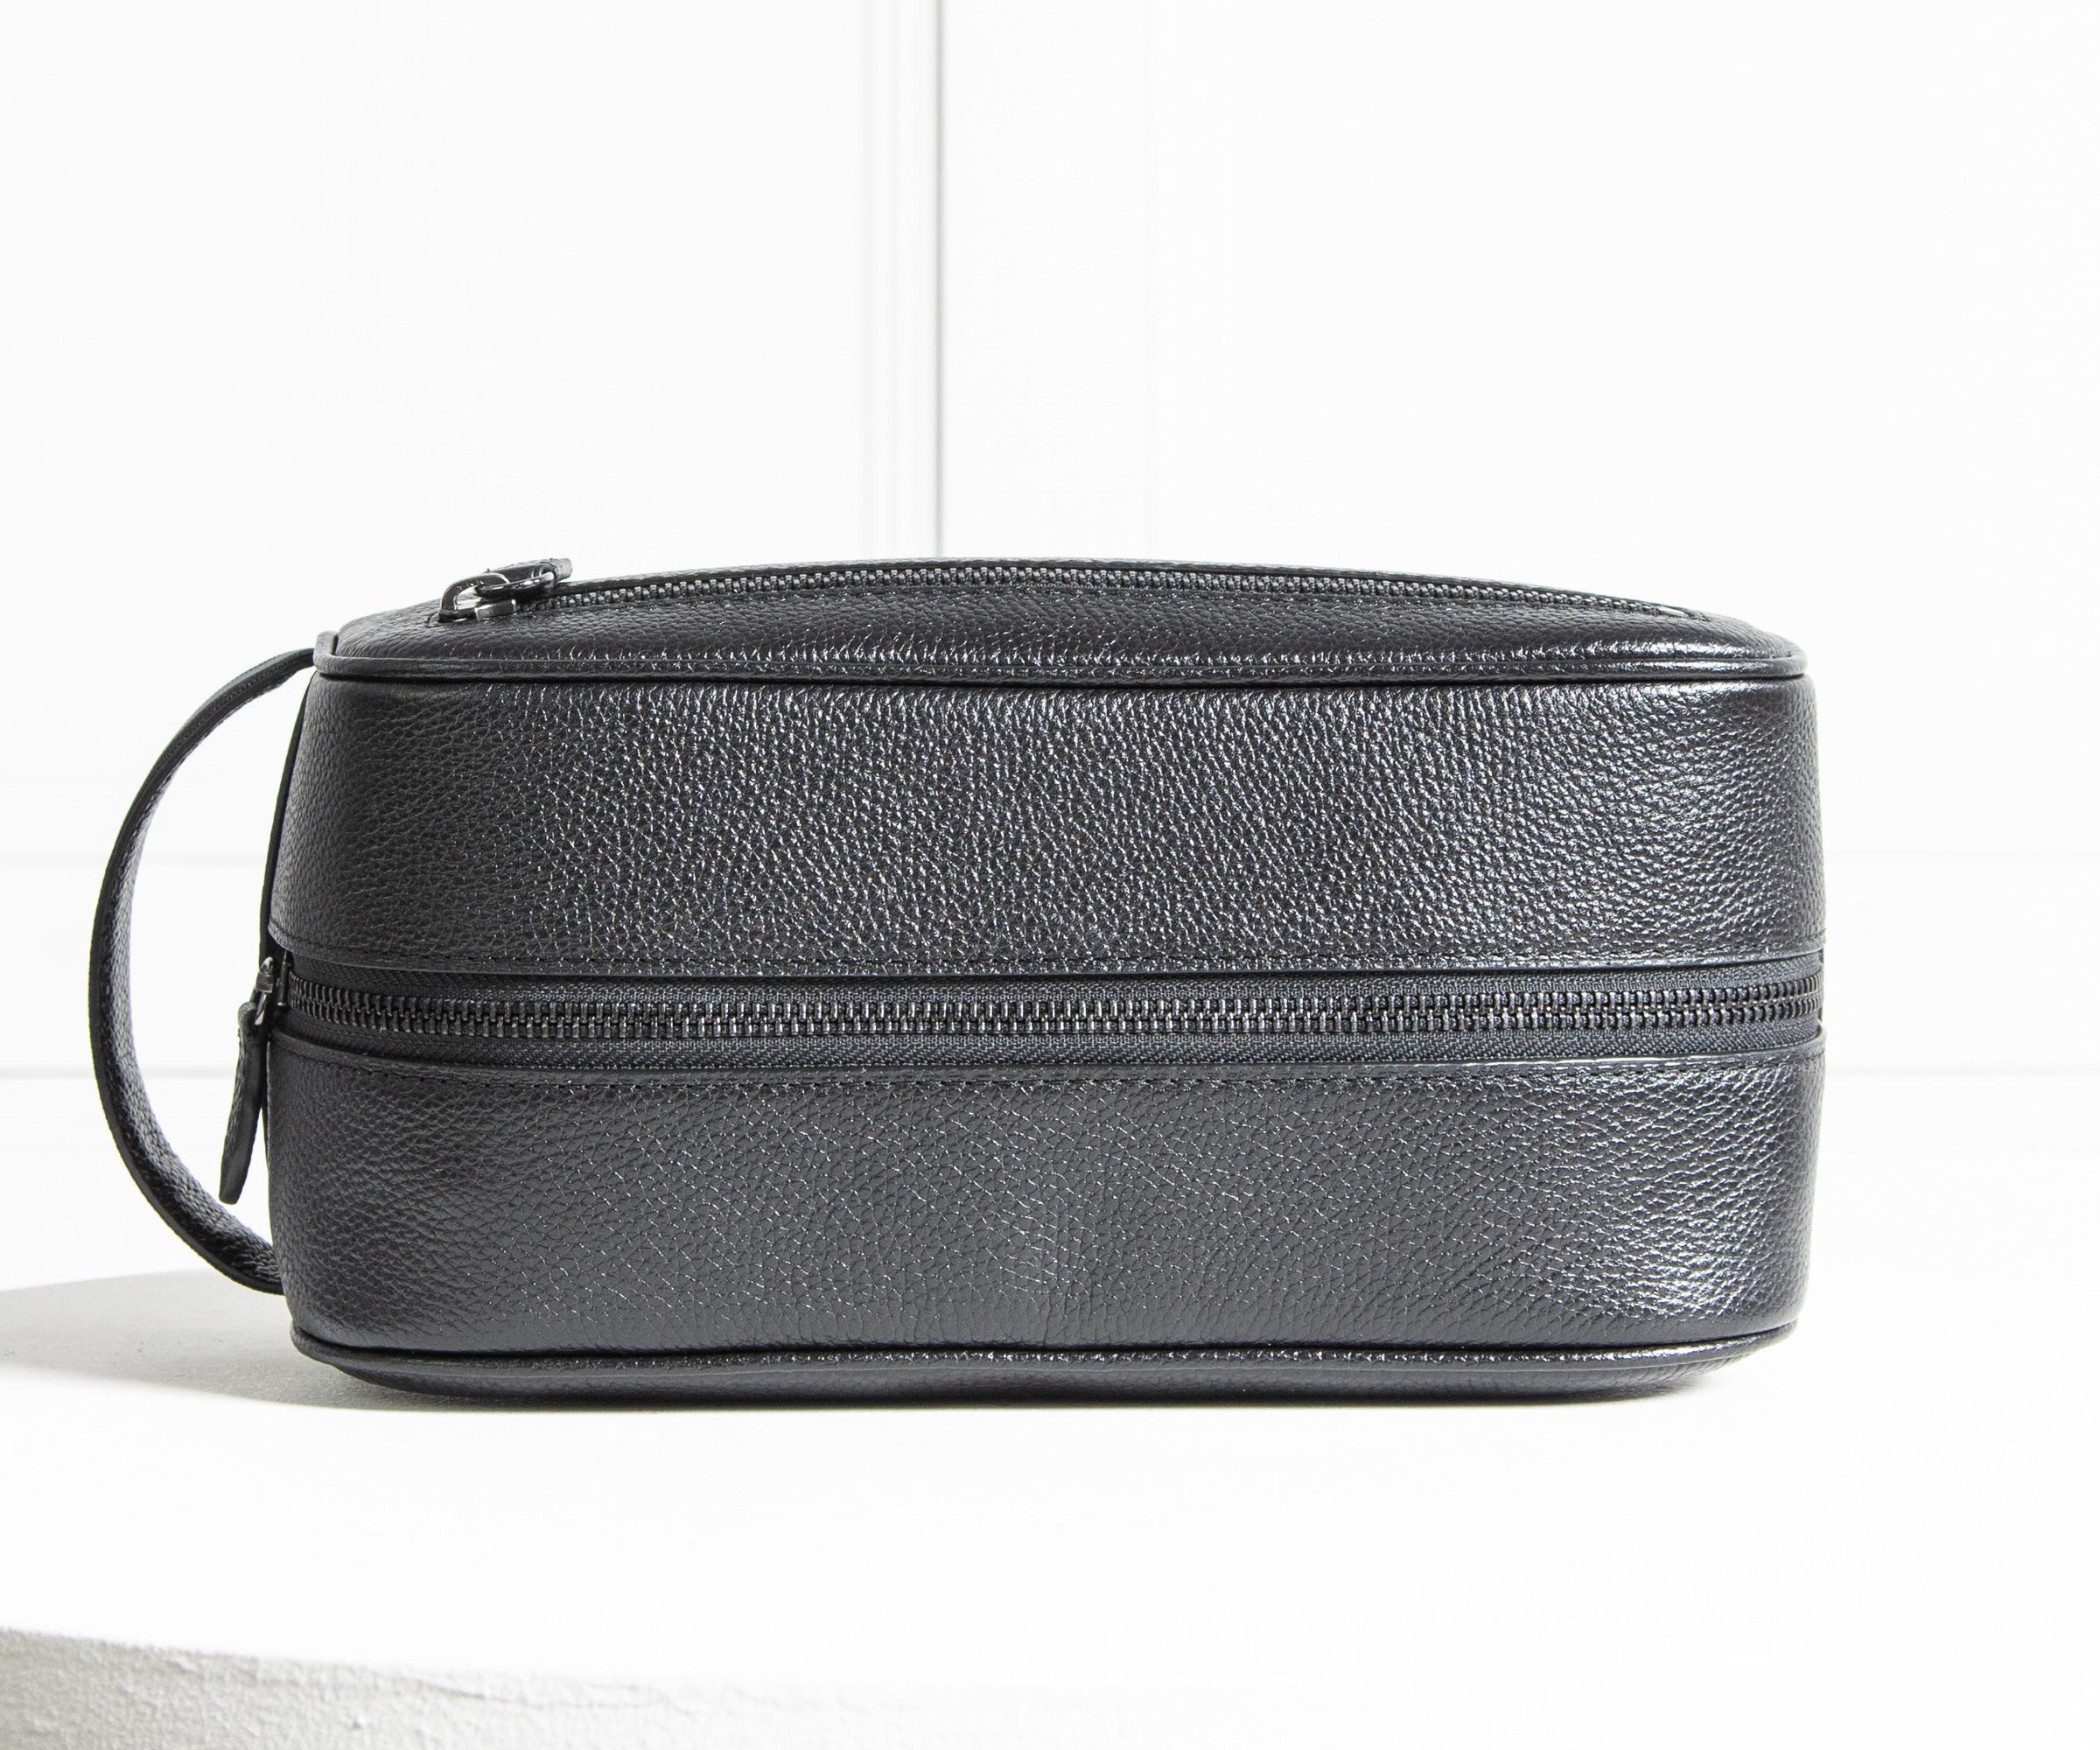 35cc744347 Lyst - Polo Ralph Lauren Leather Wash Bag Black in Black for Men